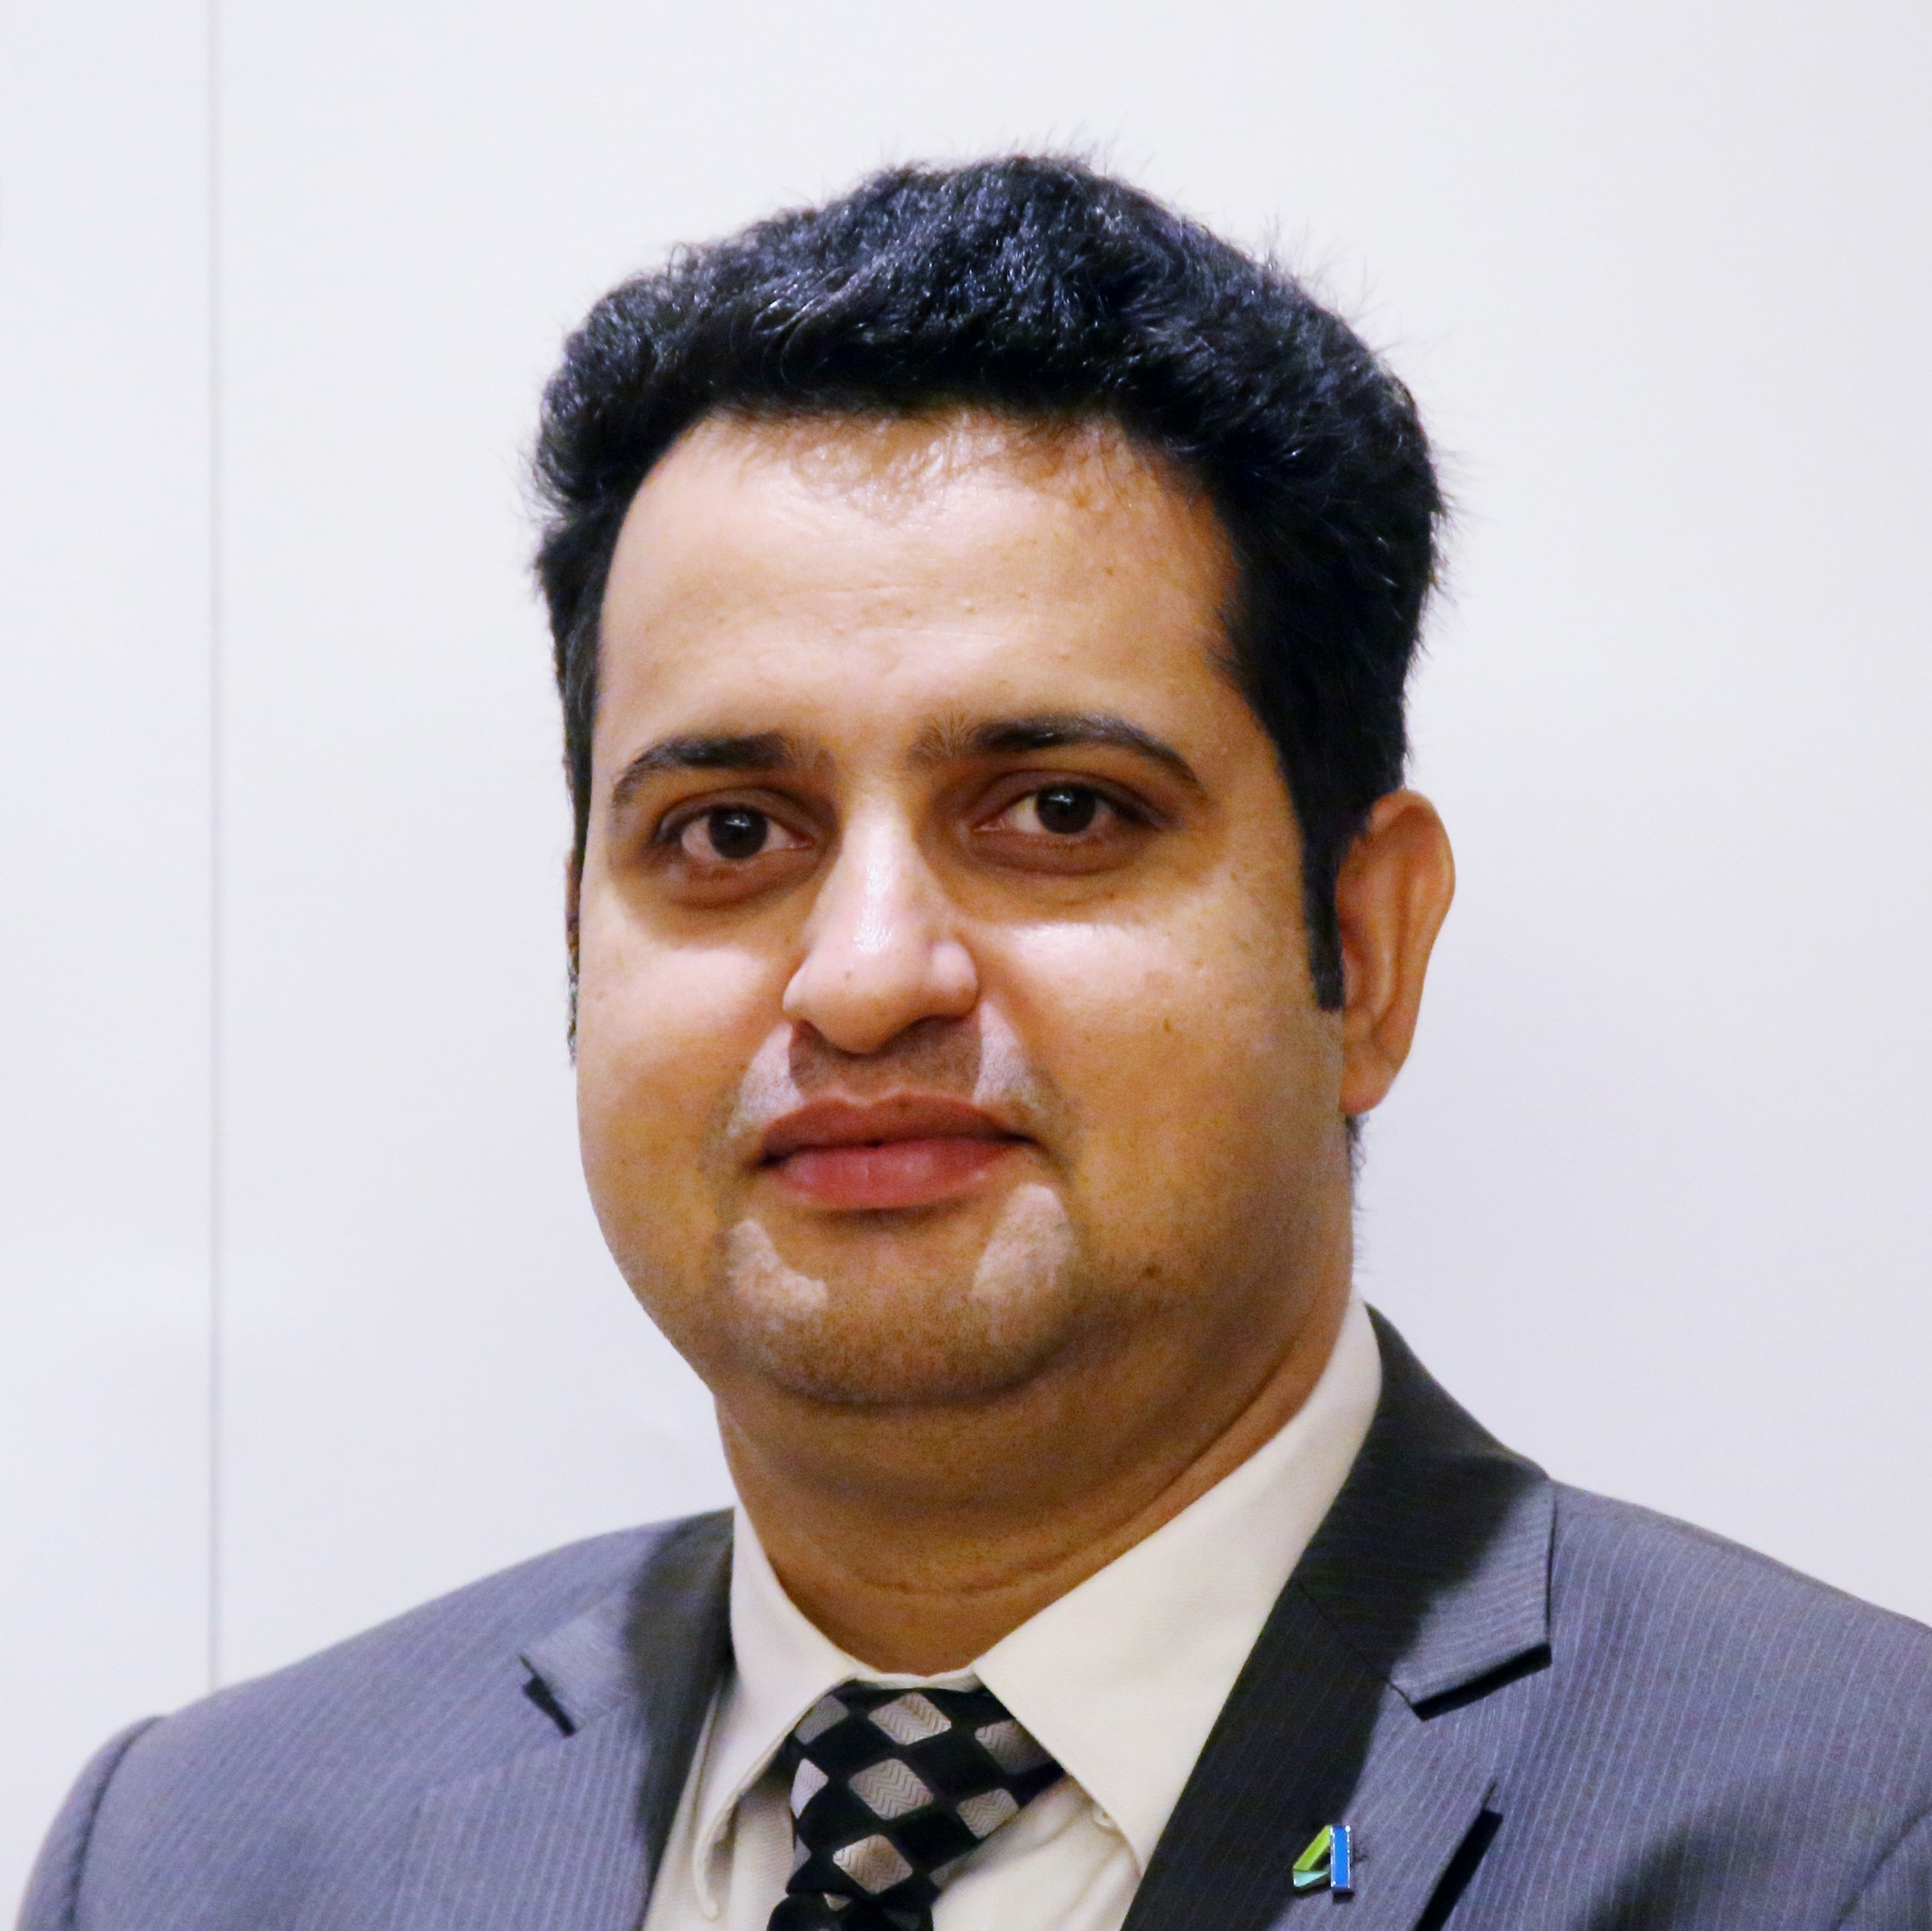 vijay.raina@autodesk.com